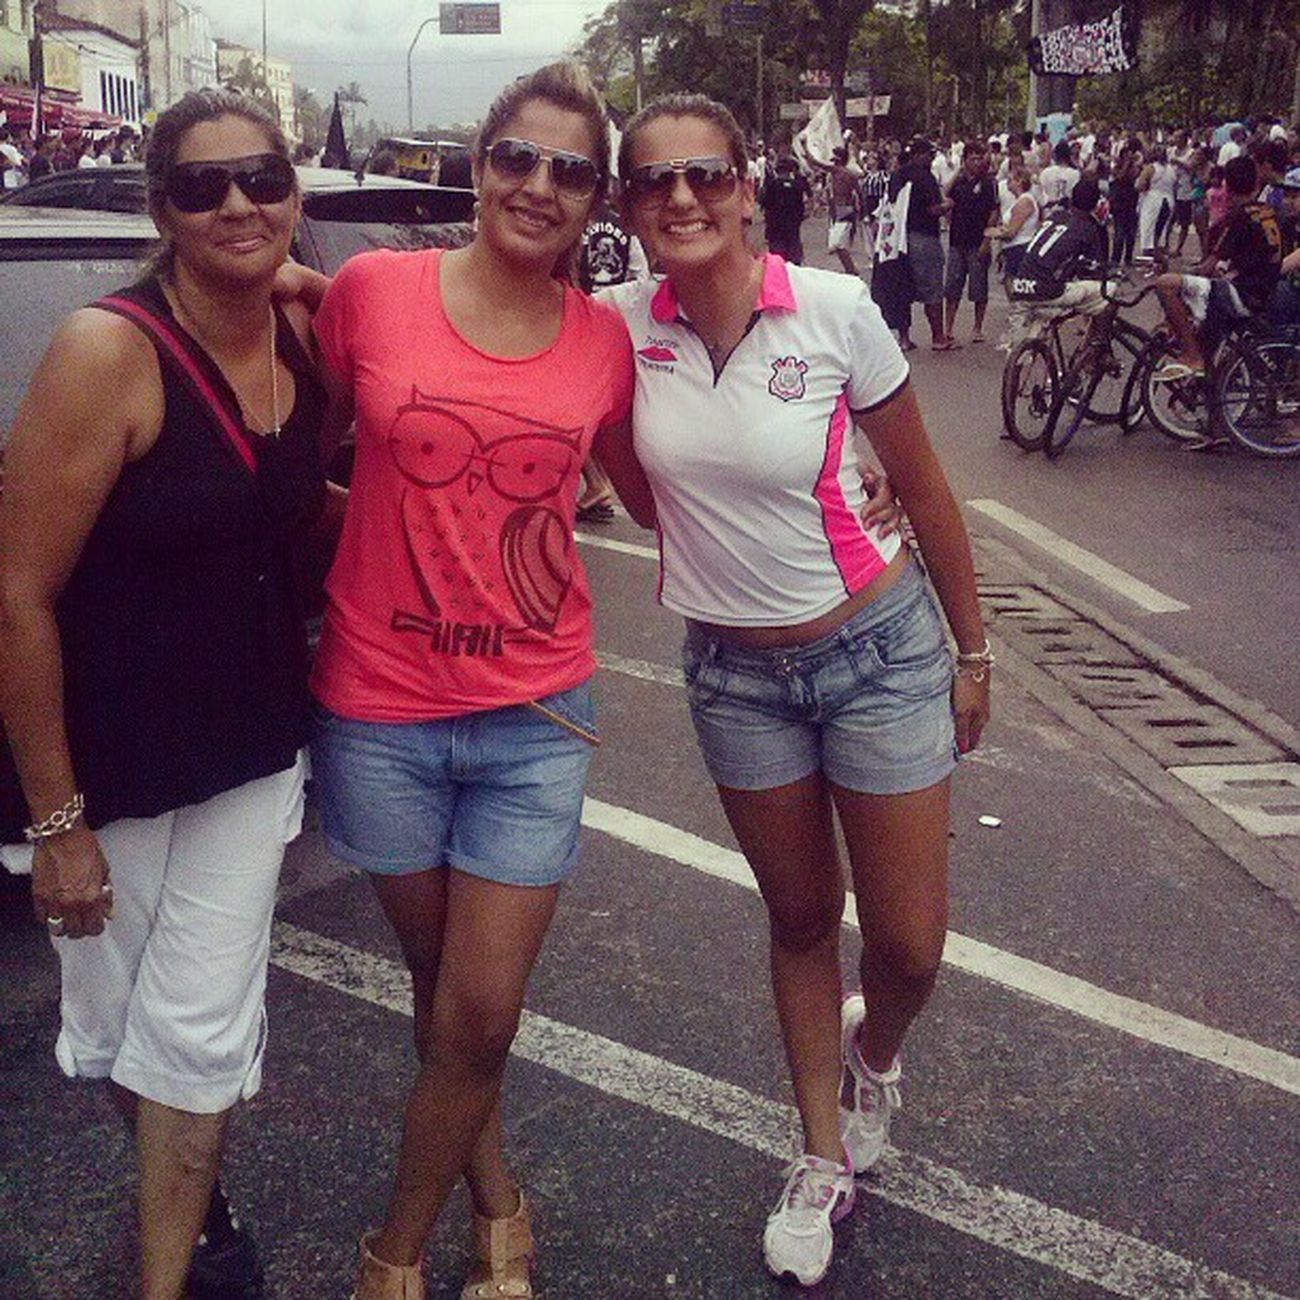 Aqui é corinthiaaaaans ! Family Corinthians Campeao Uhul @alexandracoliveira_ katyacamargo